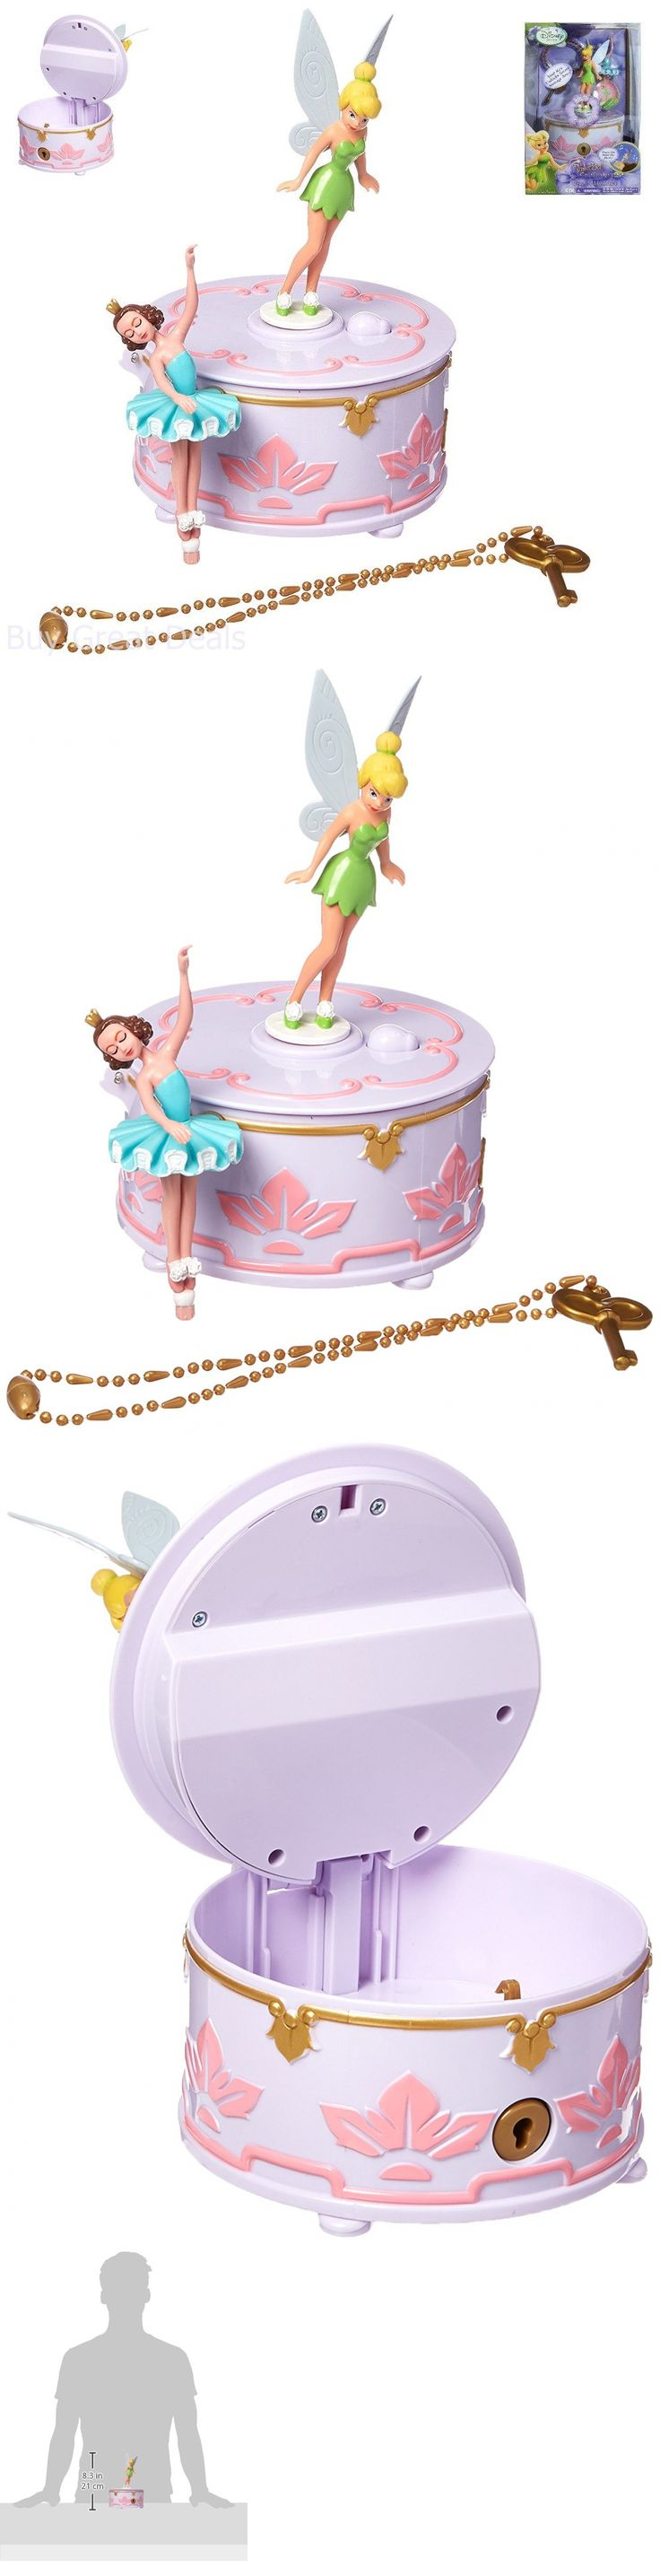 Tinker Bell Peter Pan 146041: Tinker Bell Music Box Ballerina Necklace Toy Decor Preschool Girls Set New -> BUY IT NOW ONLY: $122.09 on eBay!